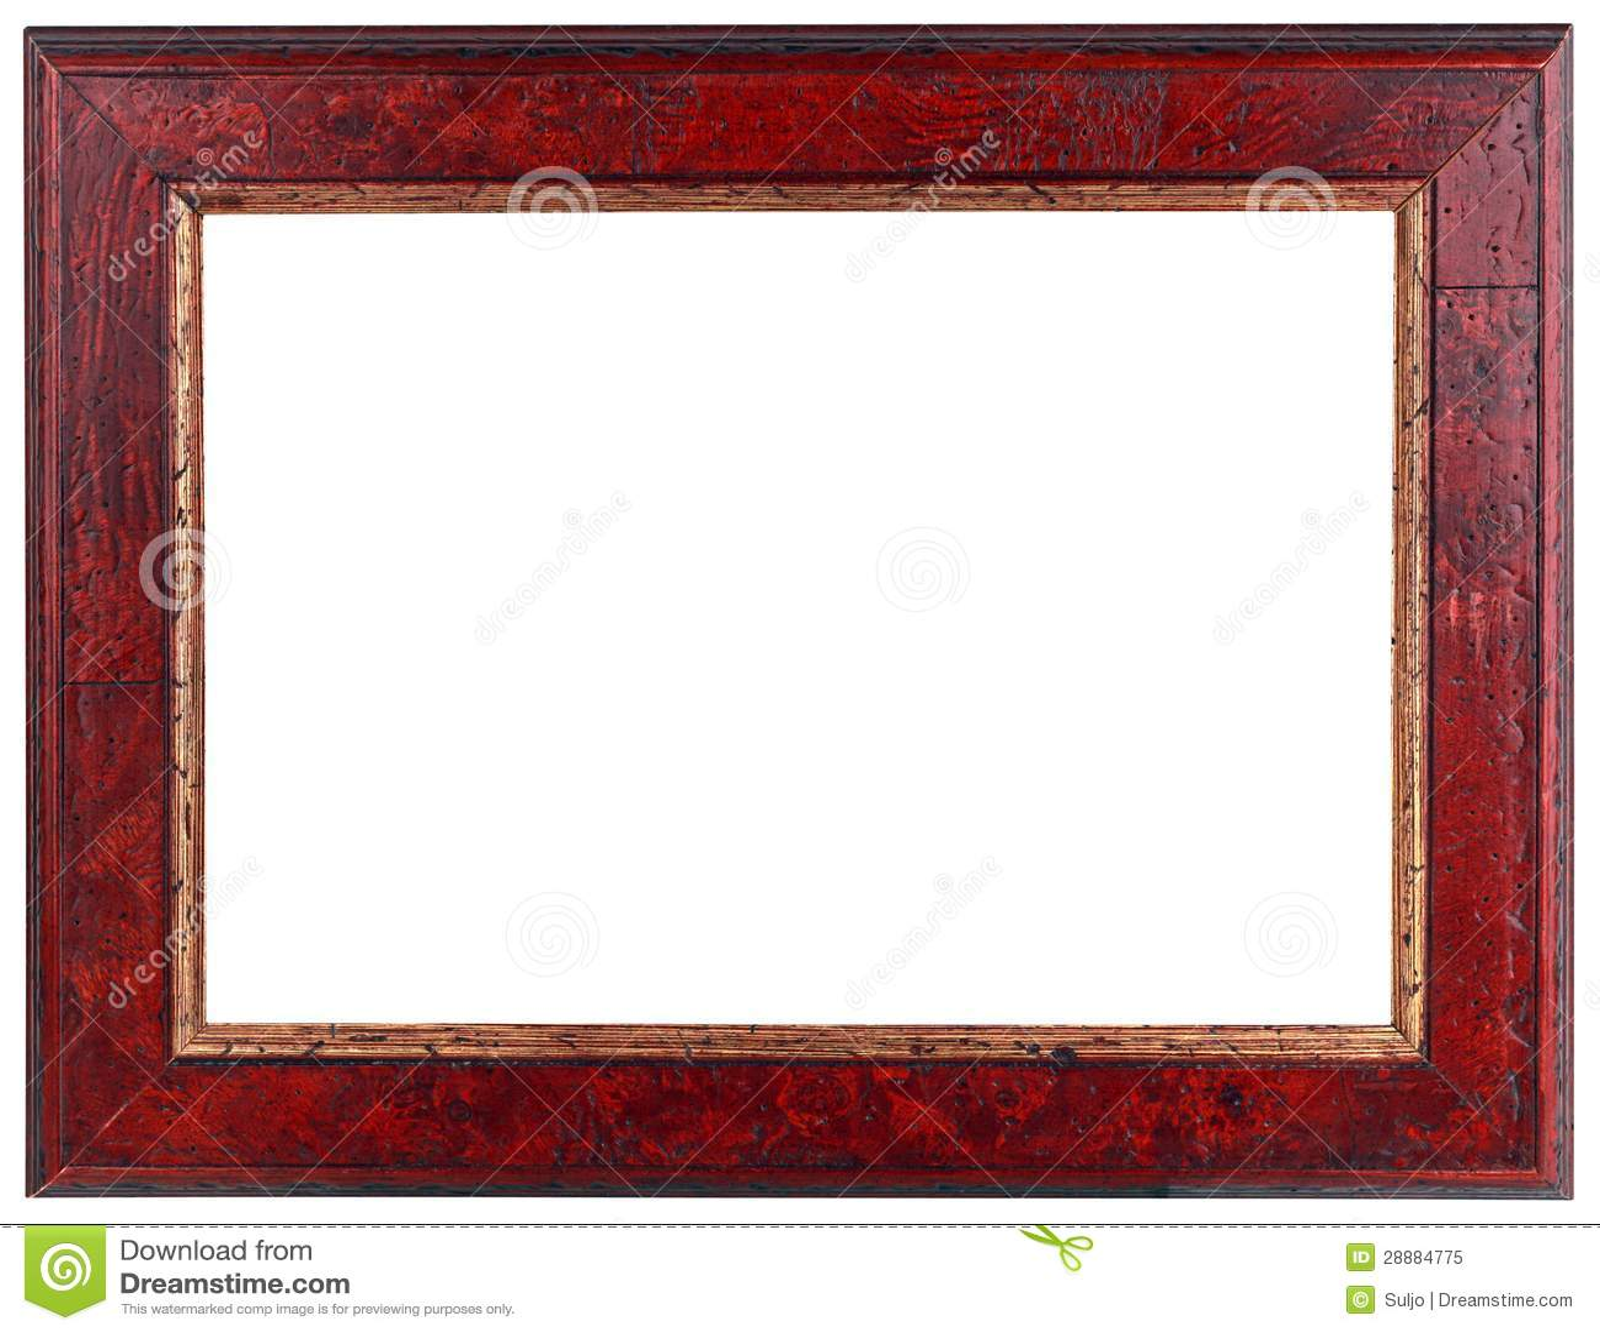 Dark red frame